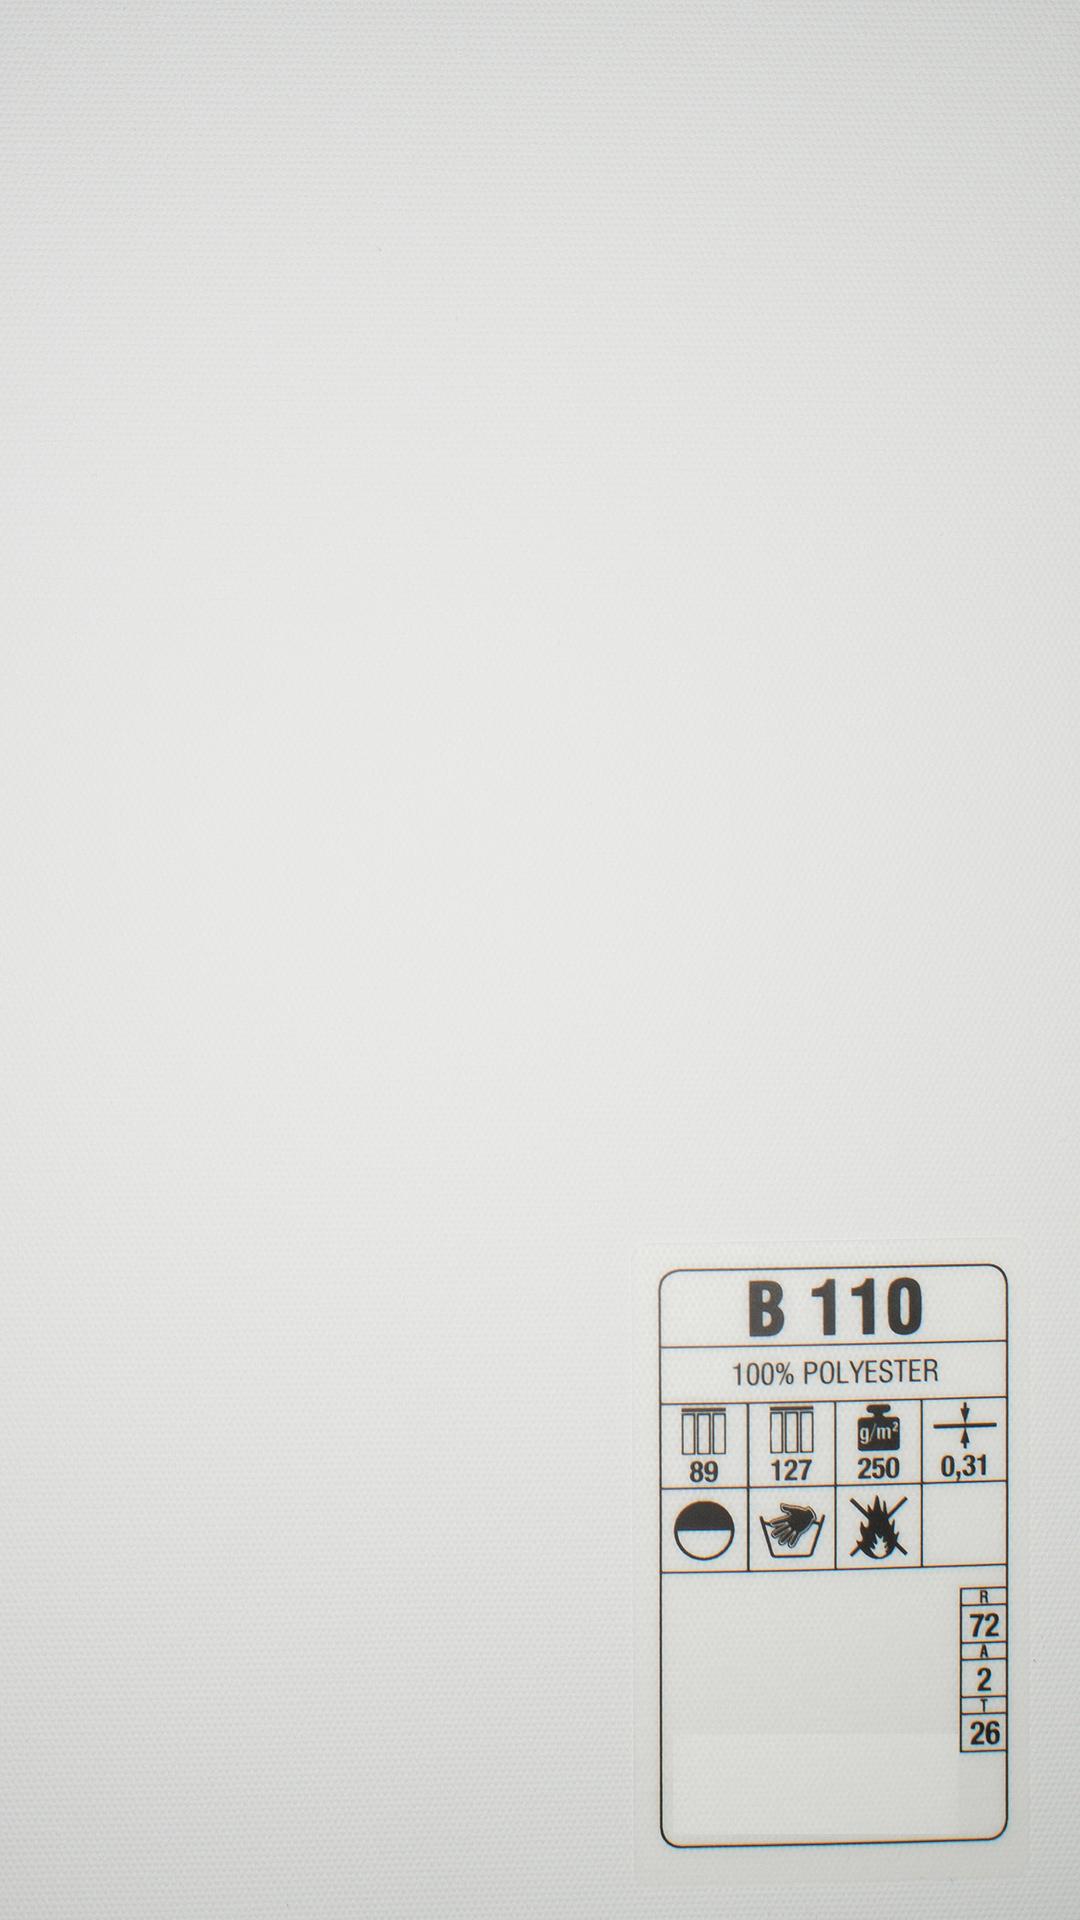 B 110